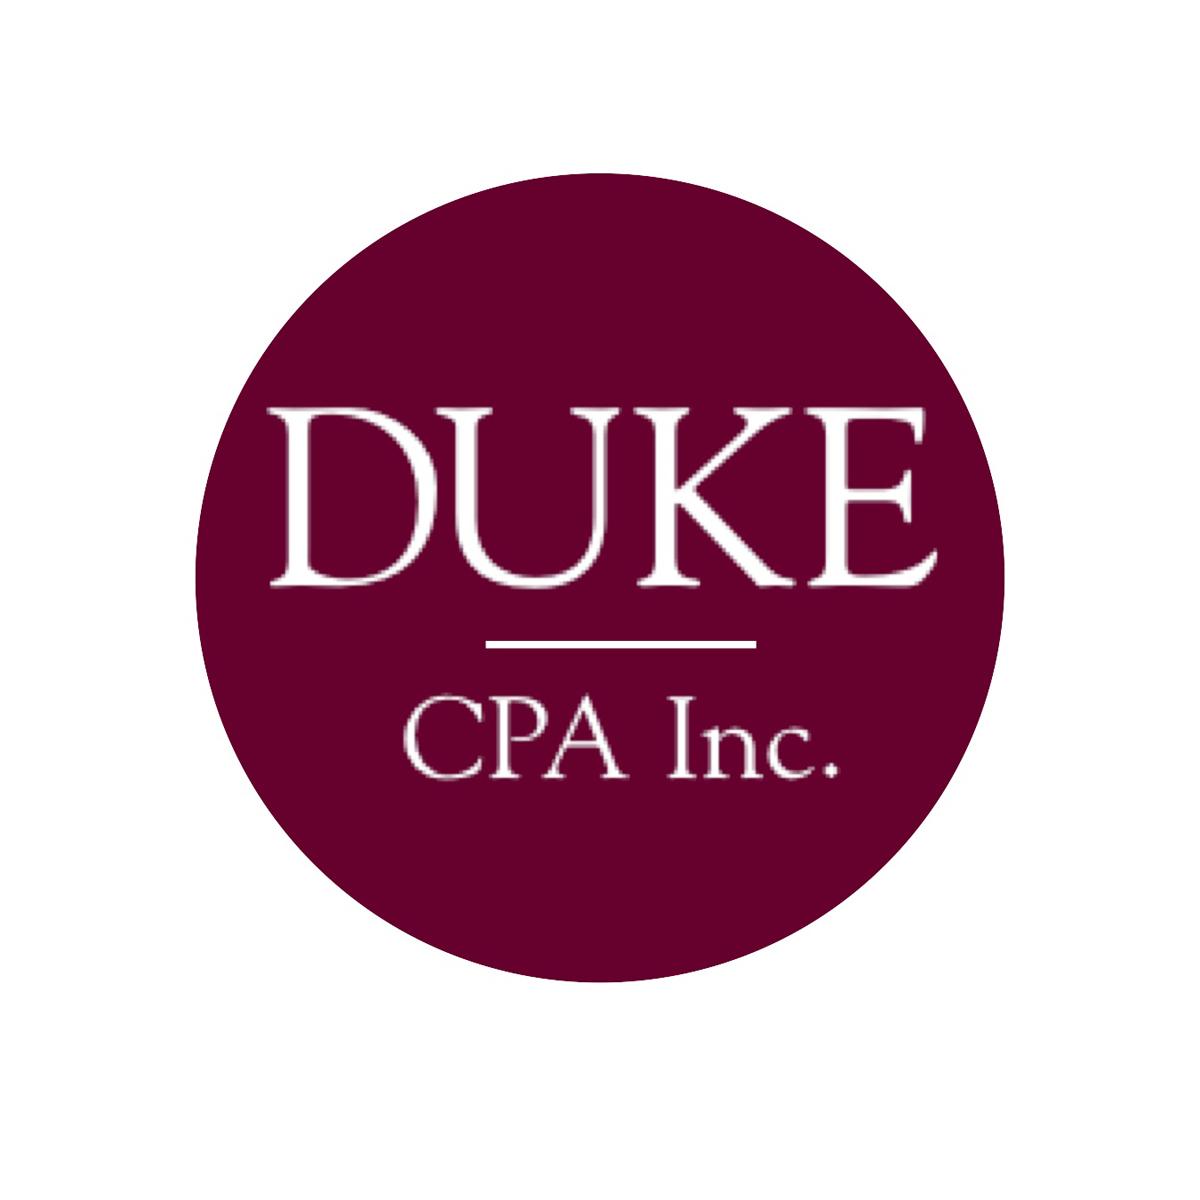 DUKE CPA Inc.